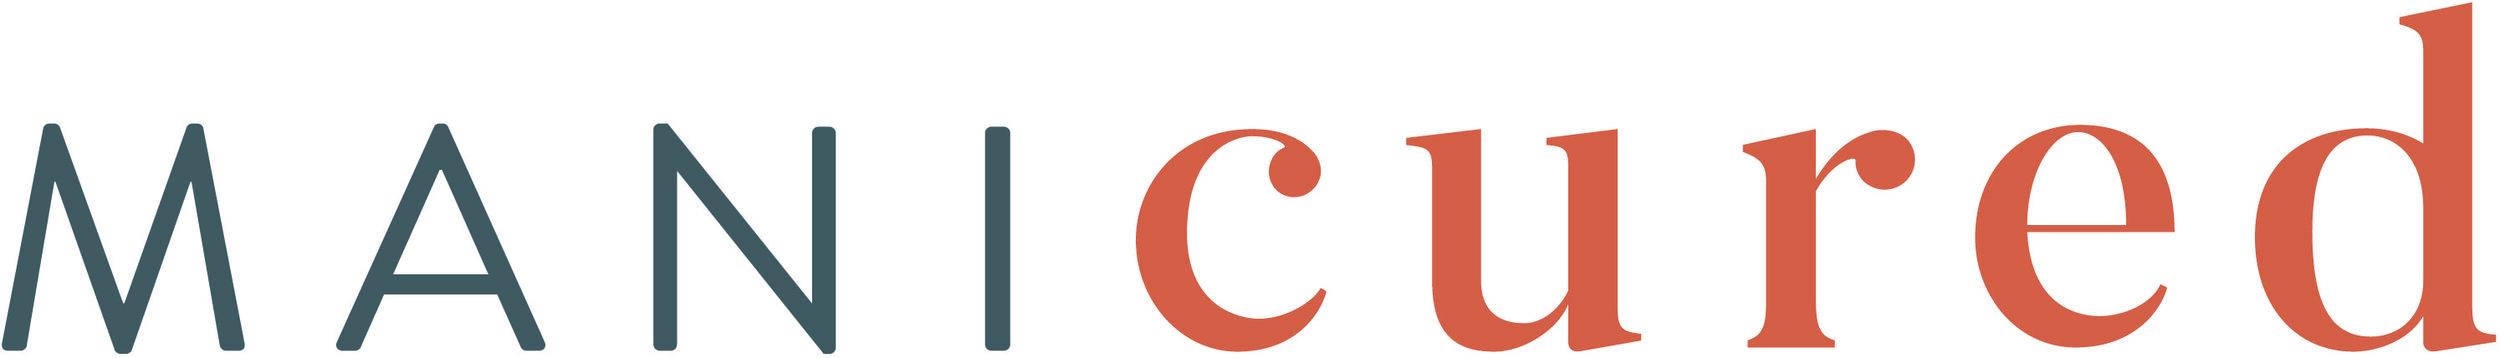 ManiCured LogoType_Color.jpg